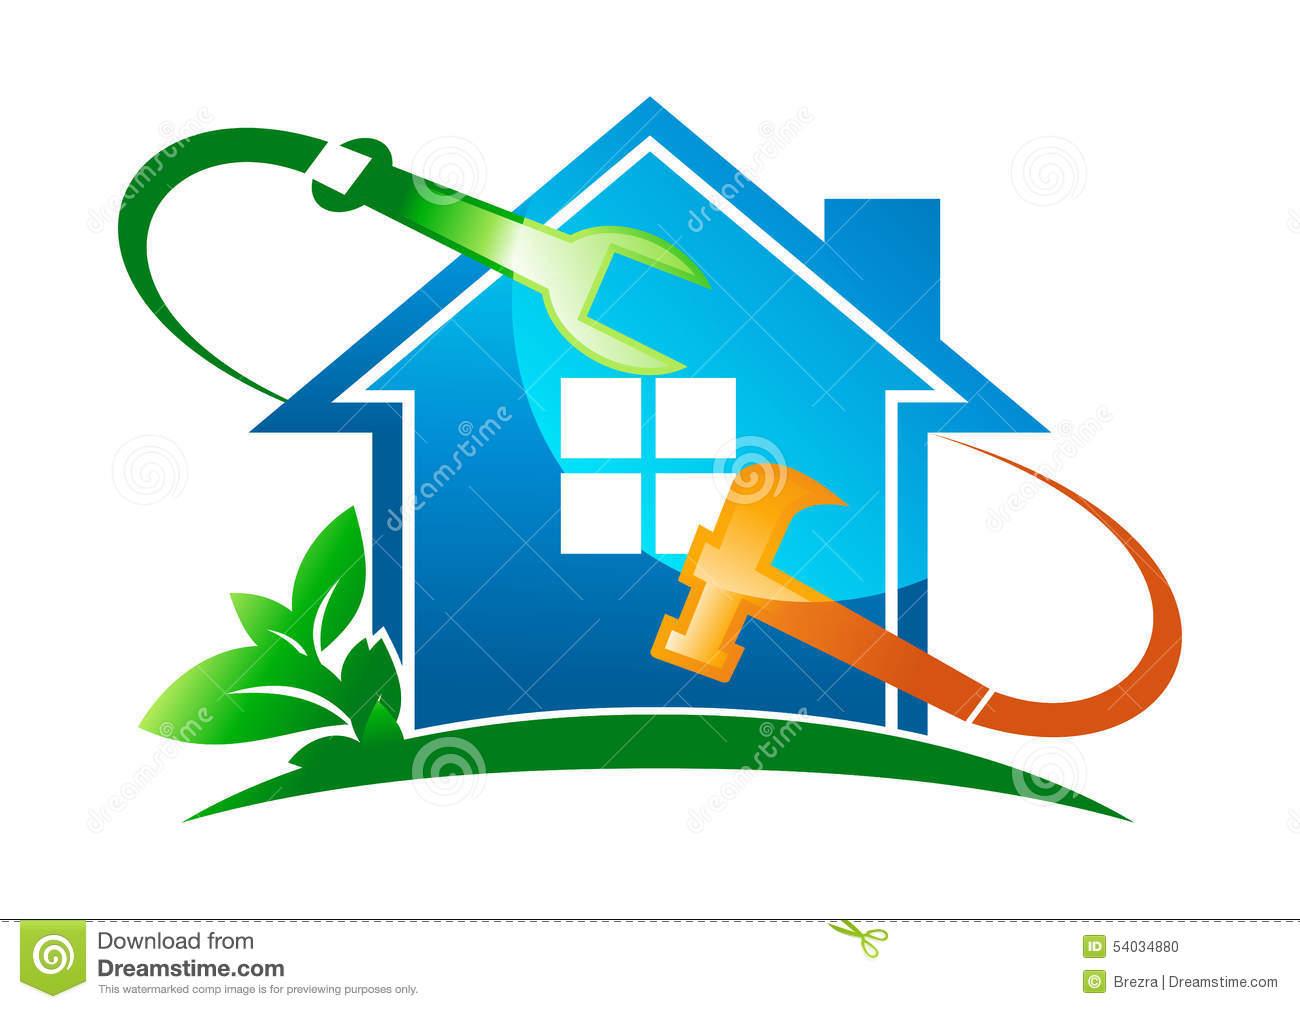 Home Service LTD